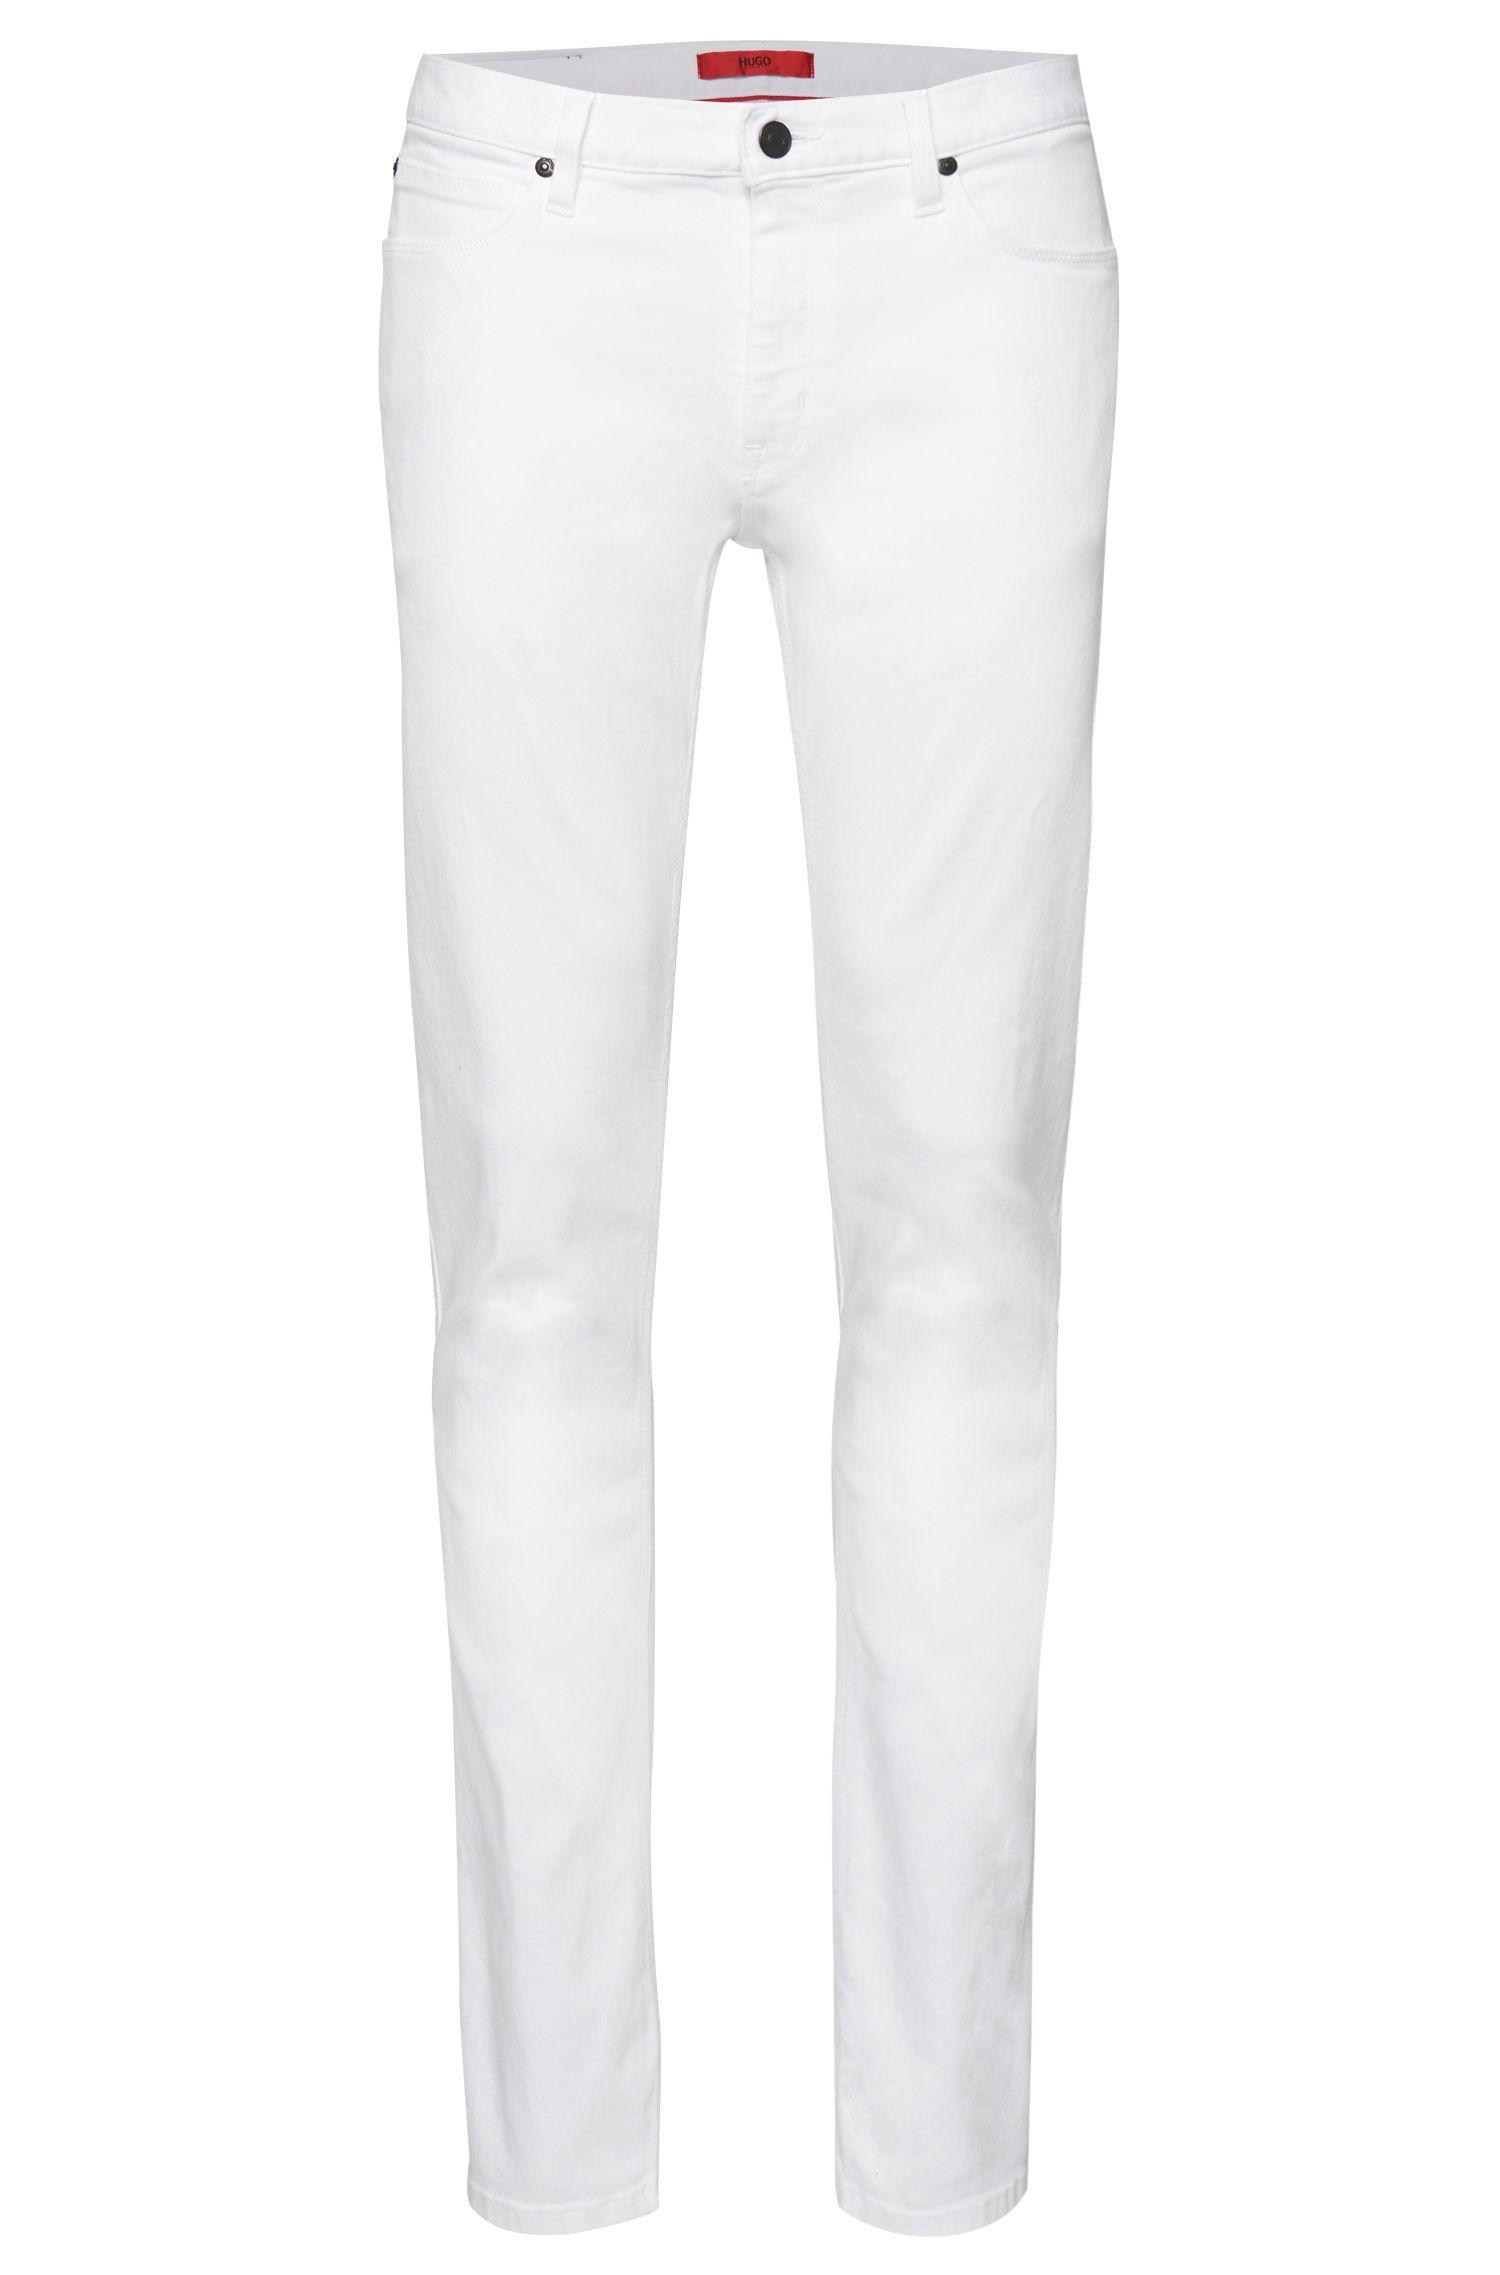 'HUGO 708' | Slim Fit, 11.75 oz Stretch Cotton Jeans